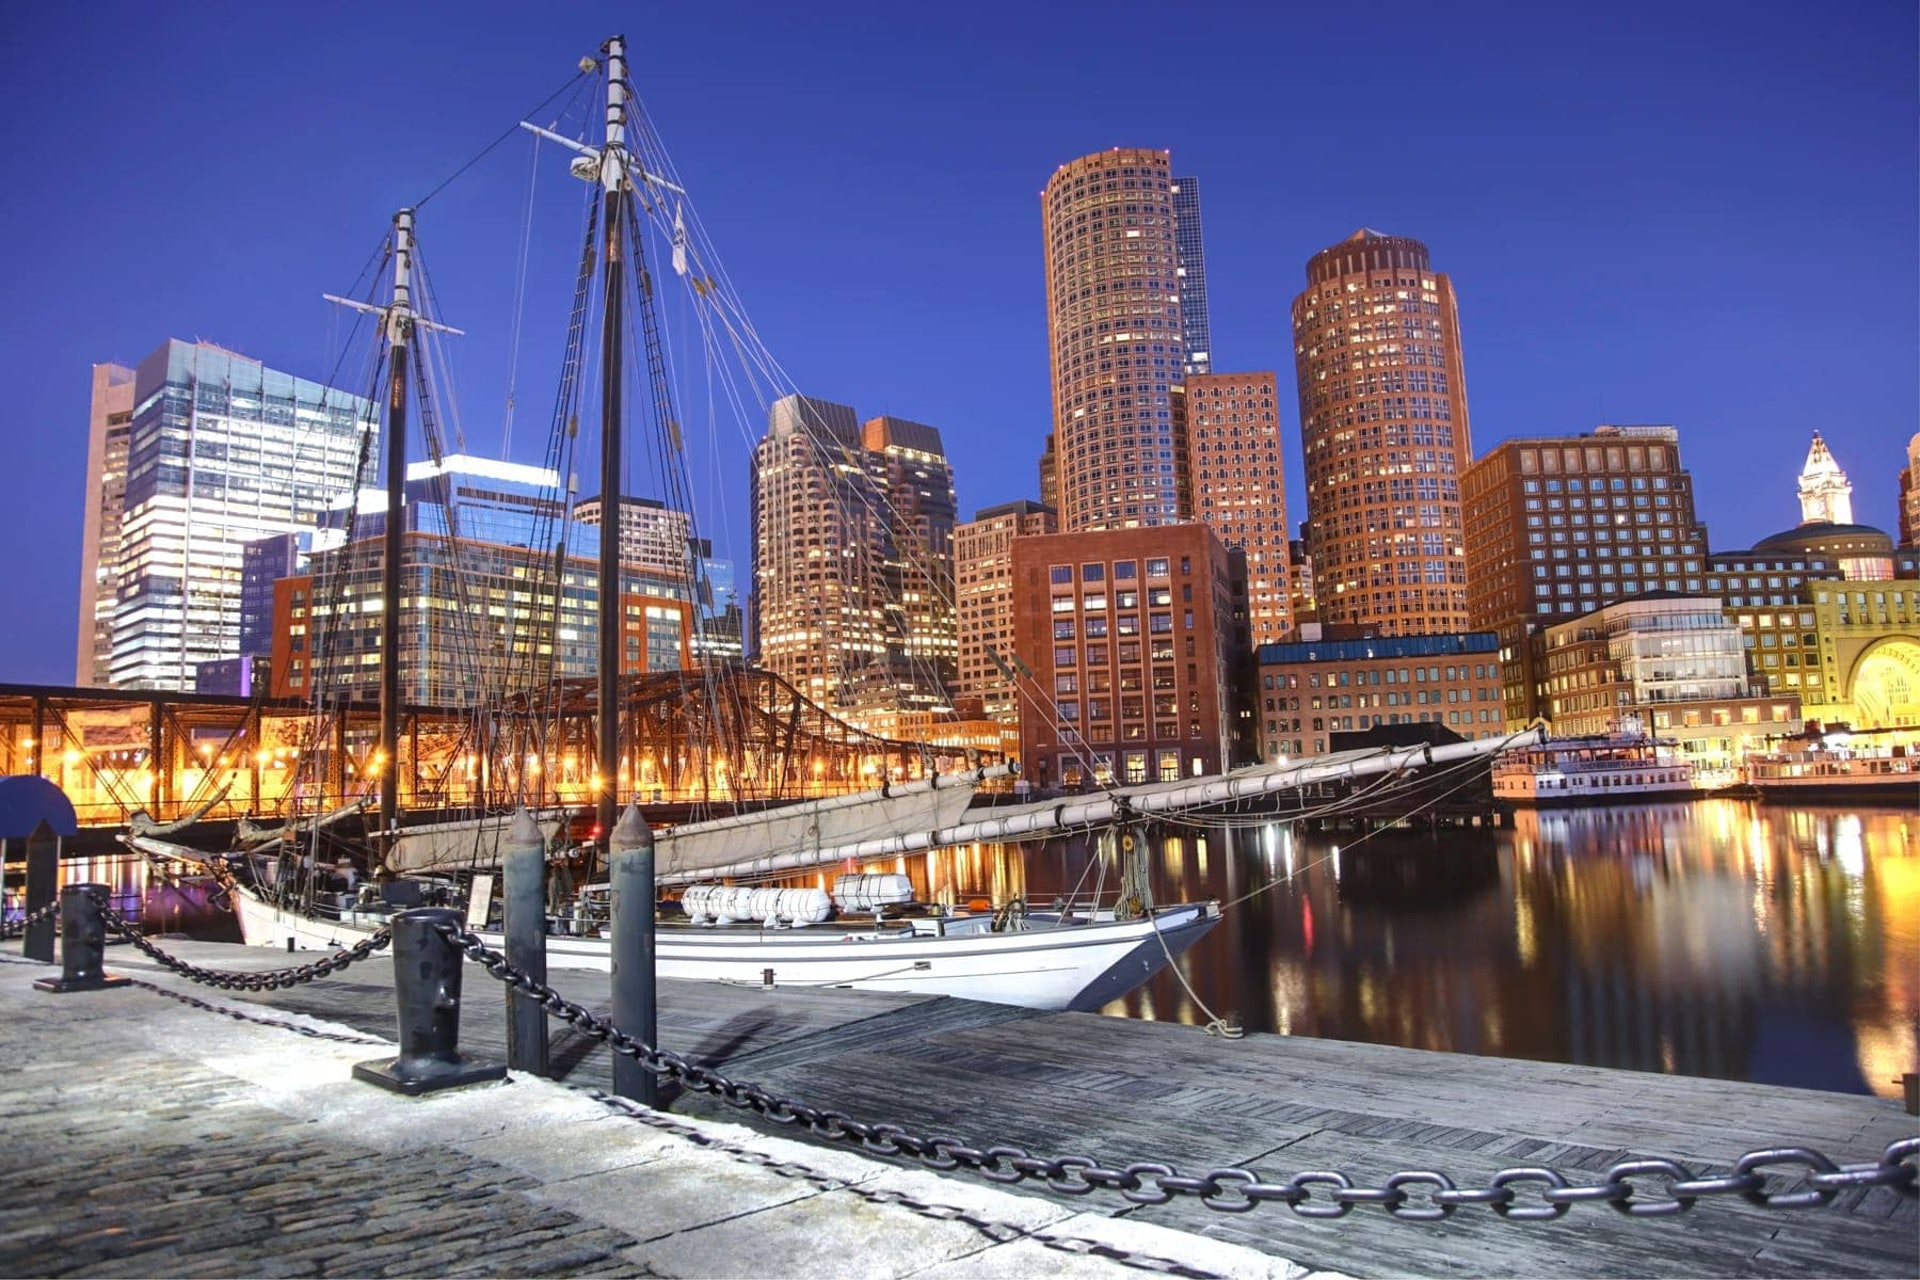 View of Boston Harbor at night